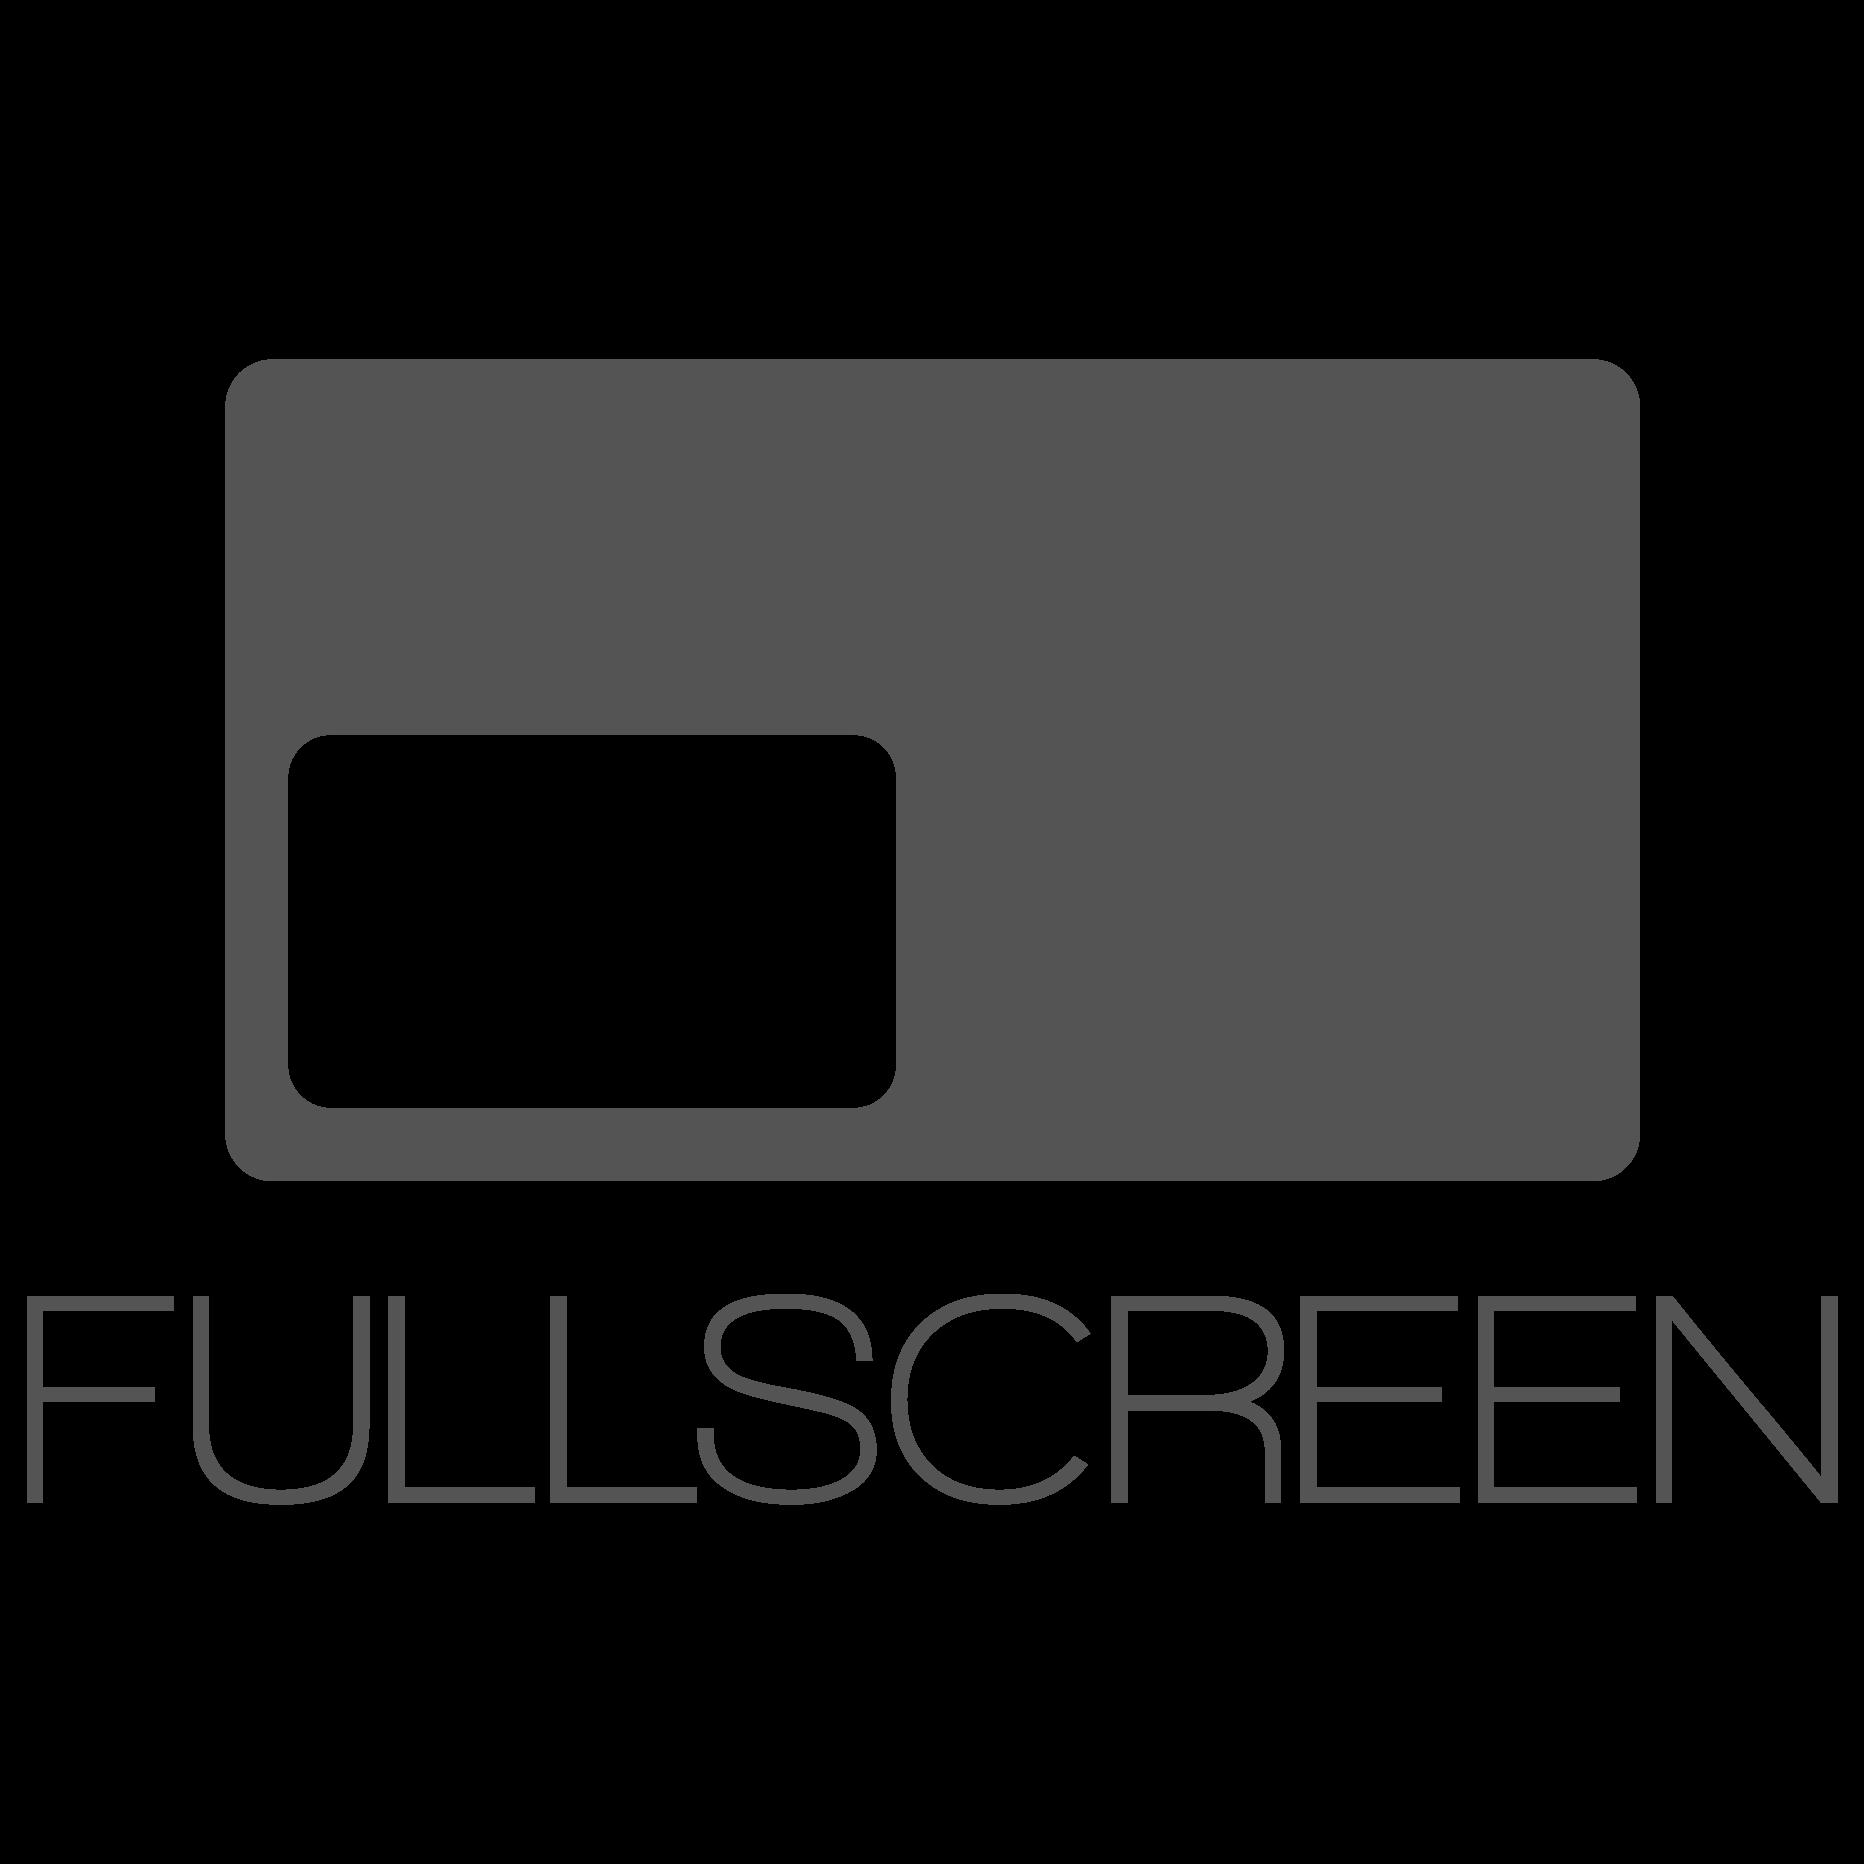 fullscreen-black-square-logo-01.png